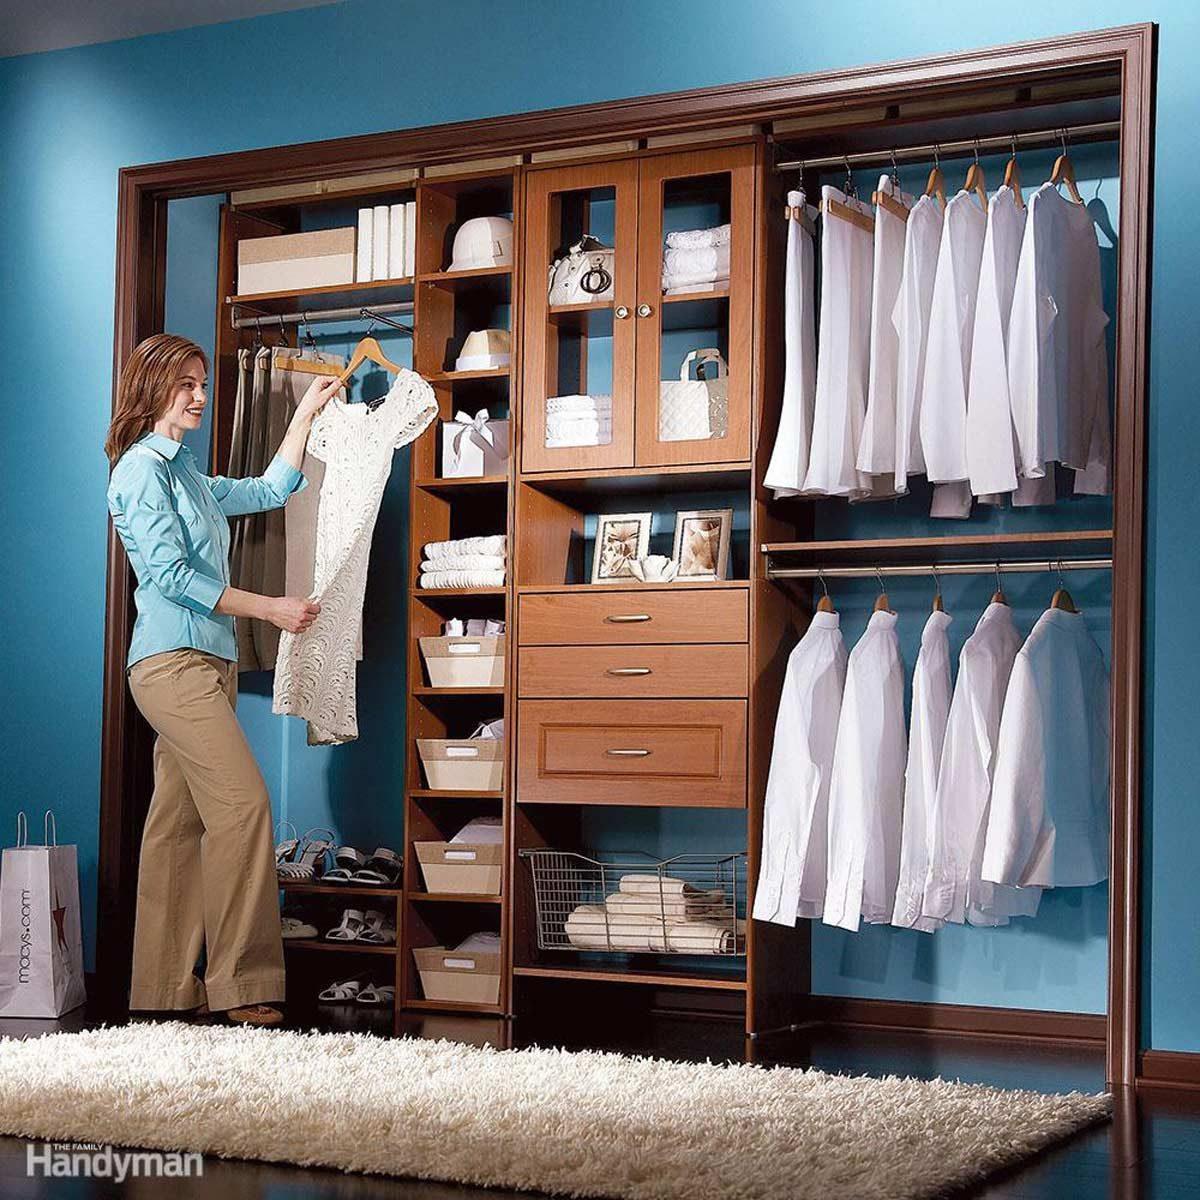 Reorganize the Closet